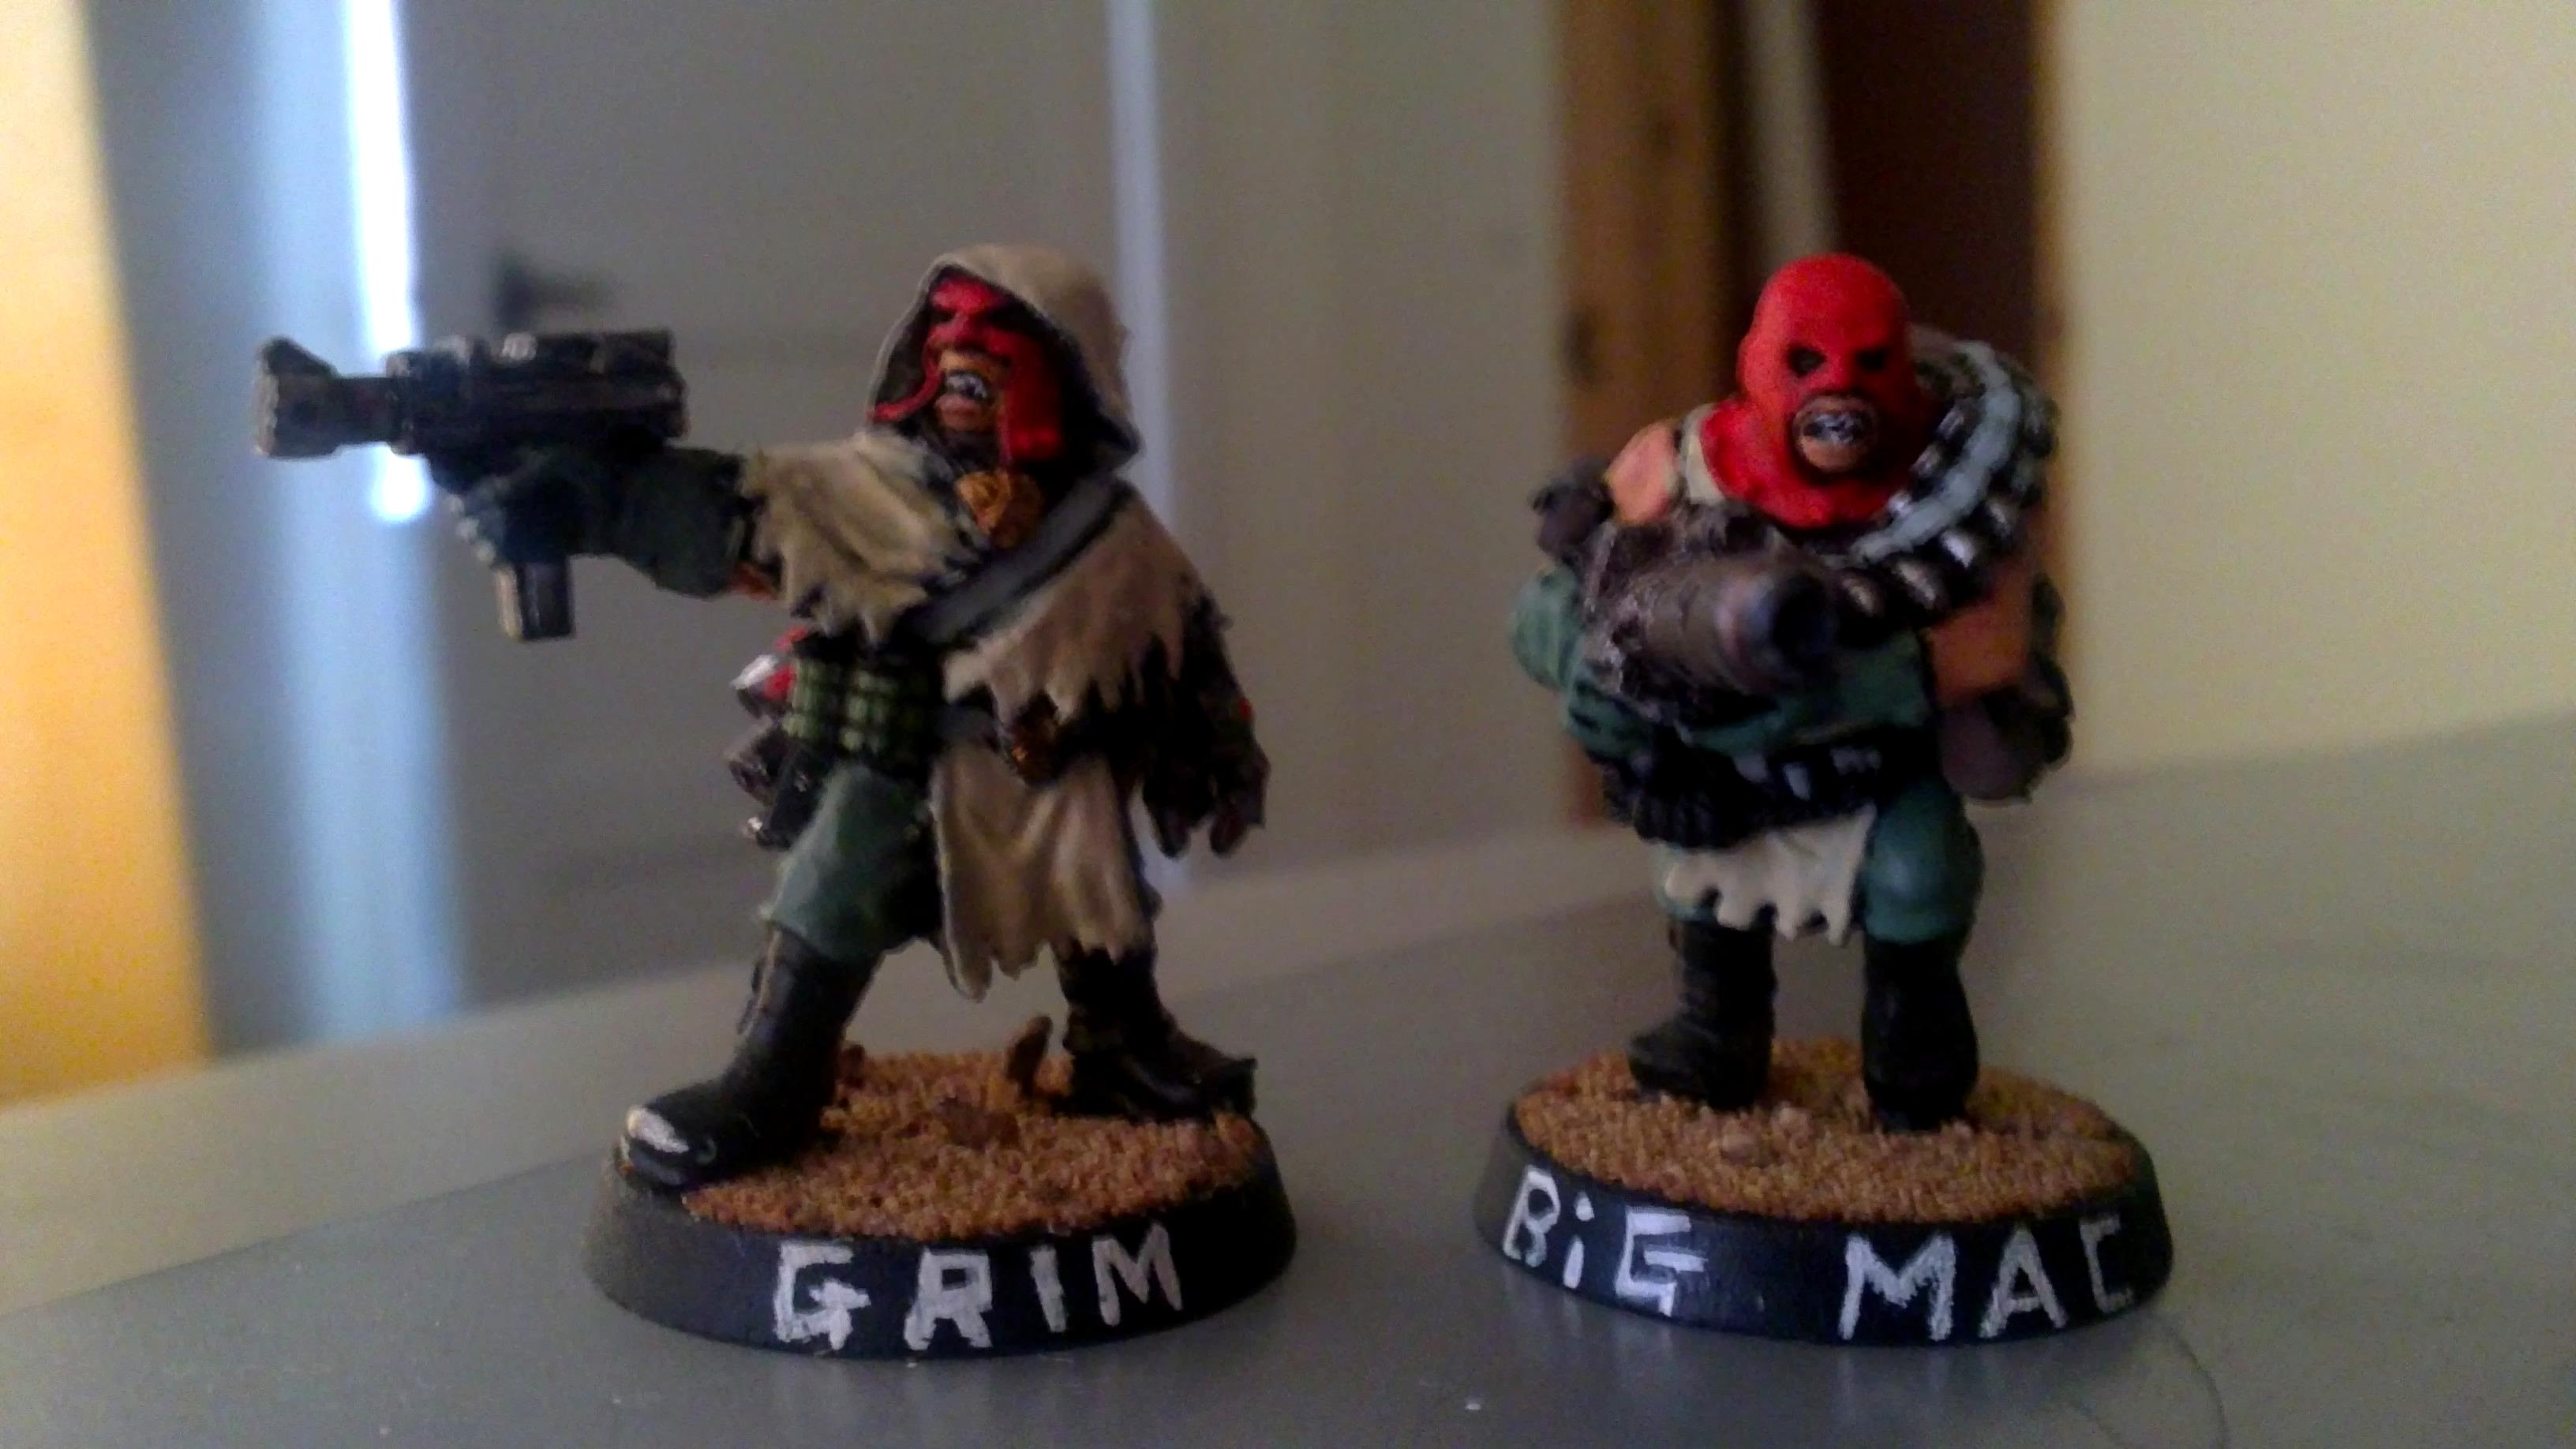 gang leader 'grim' and heavy 'big mac'